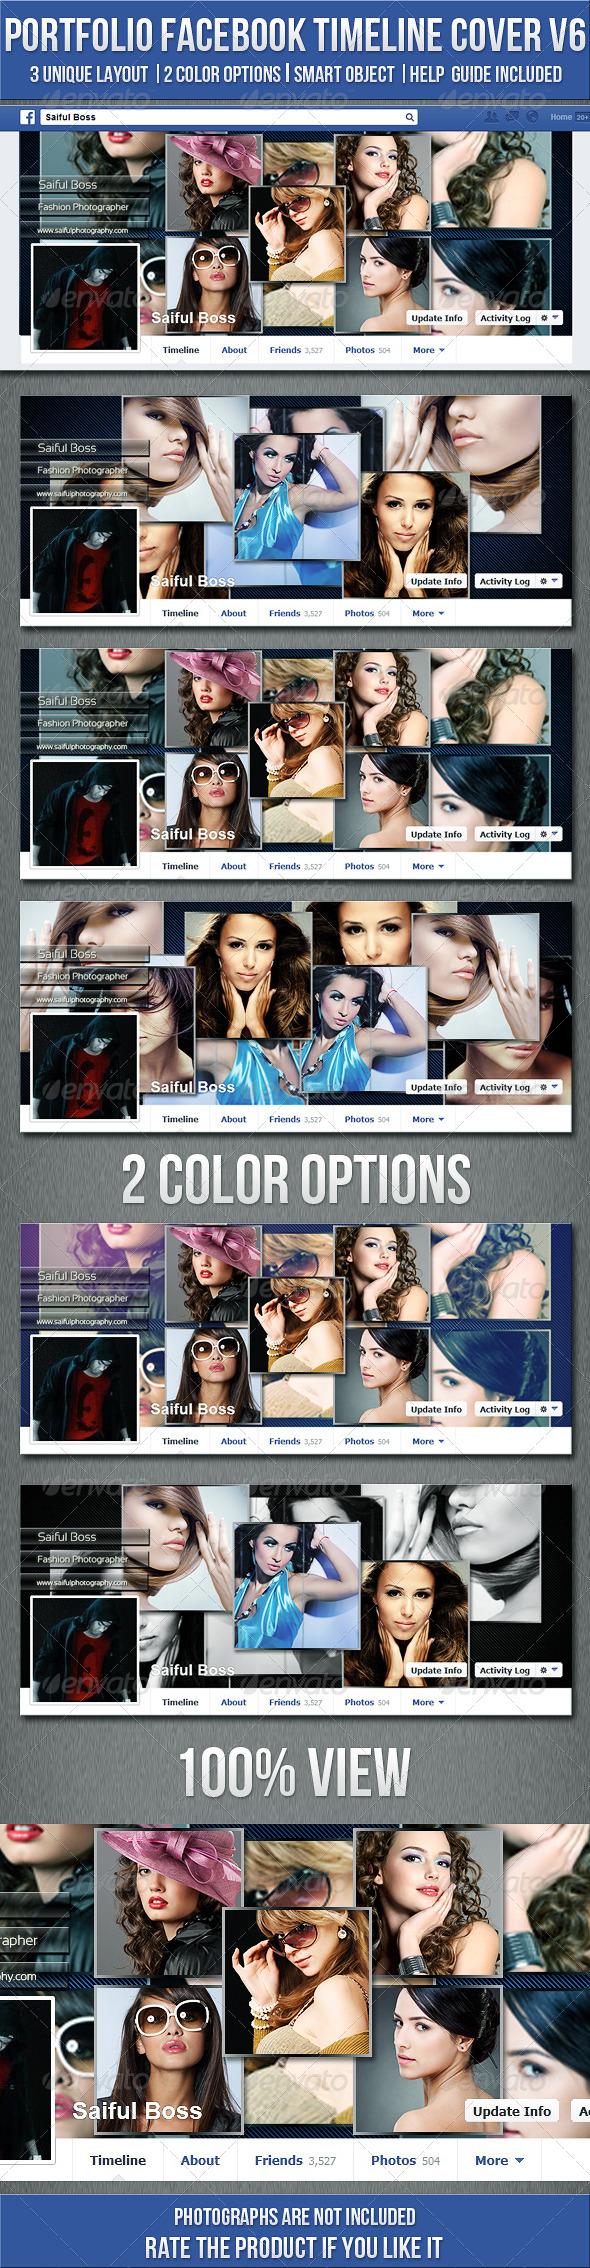 Portfolio FB Timeline Cover V6 - Facebook Timeline Covers Social Media